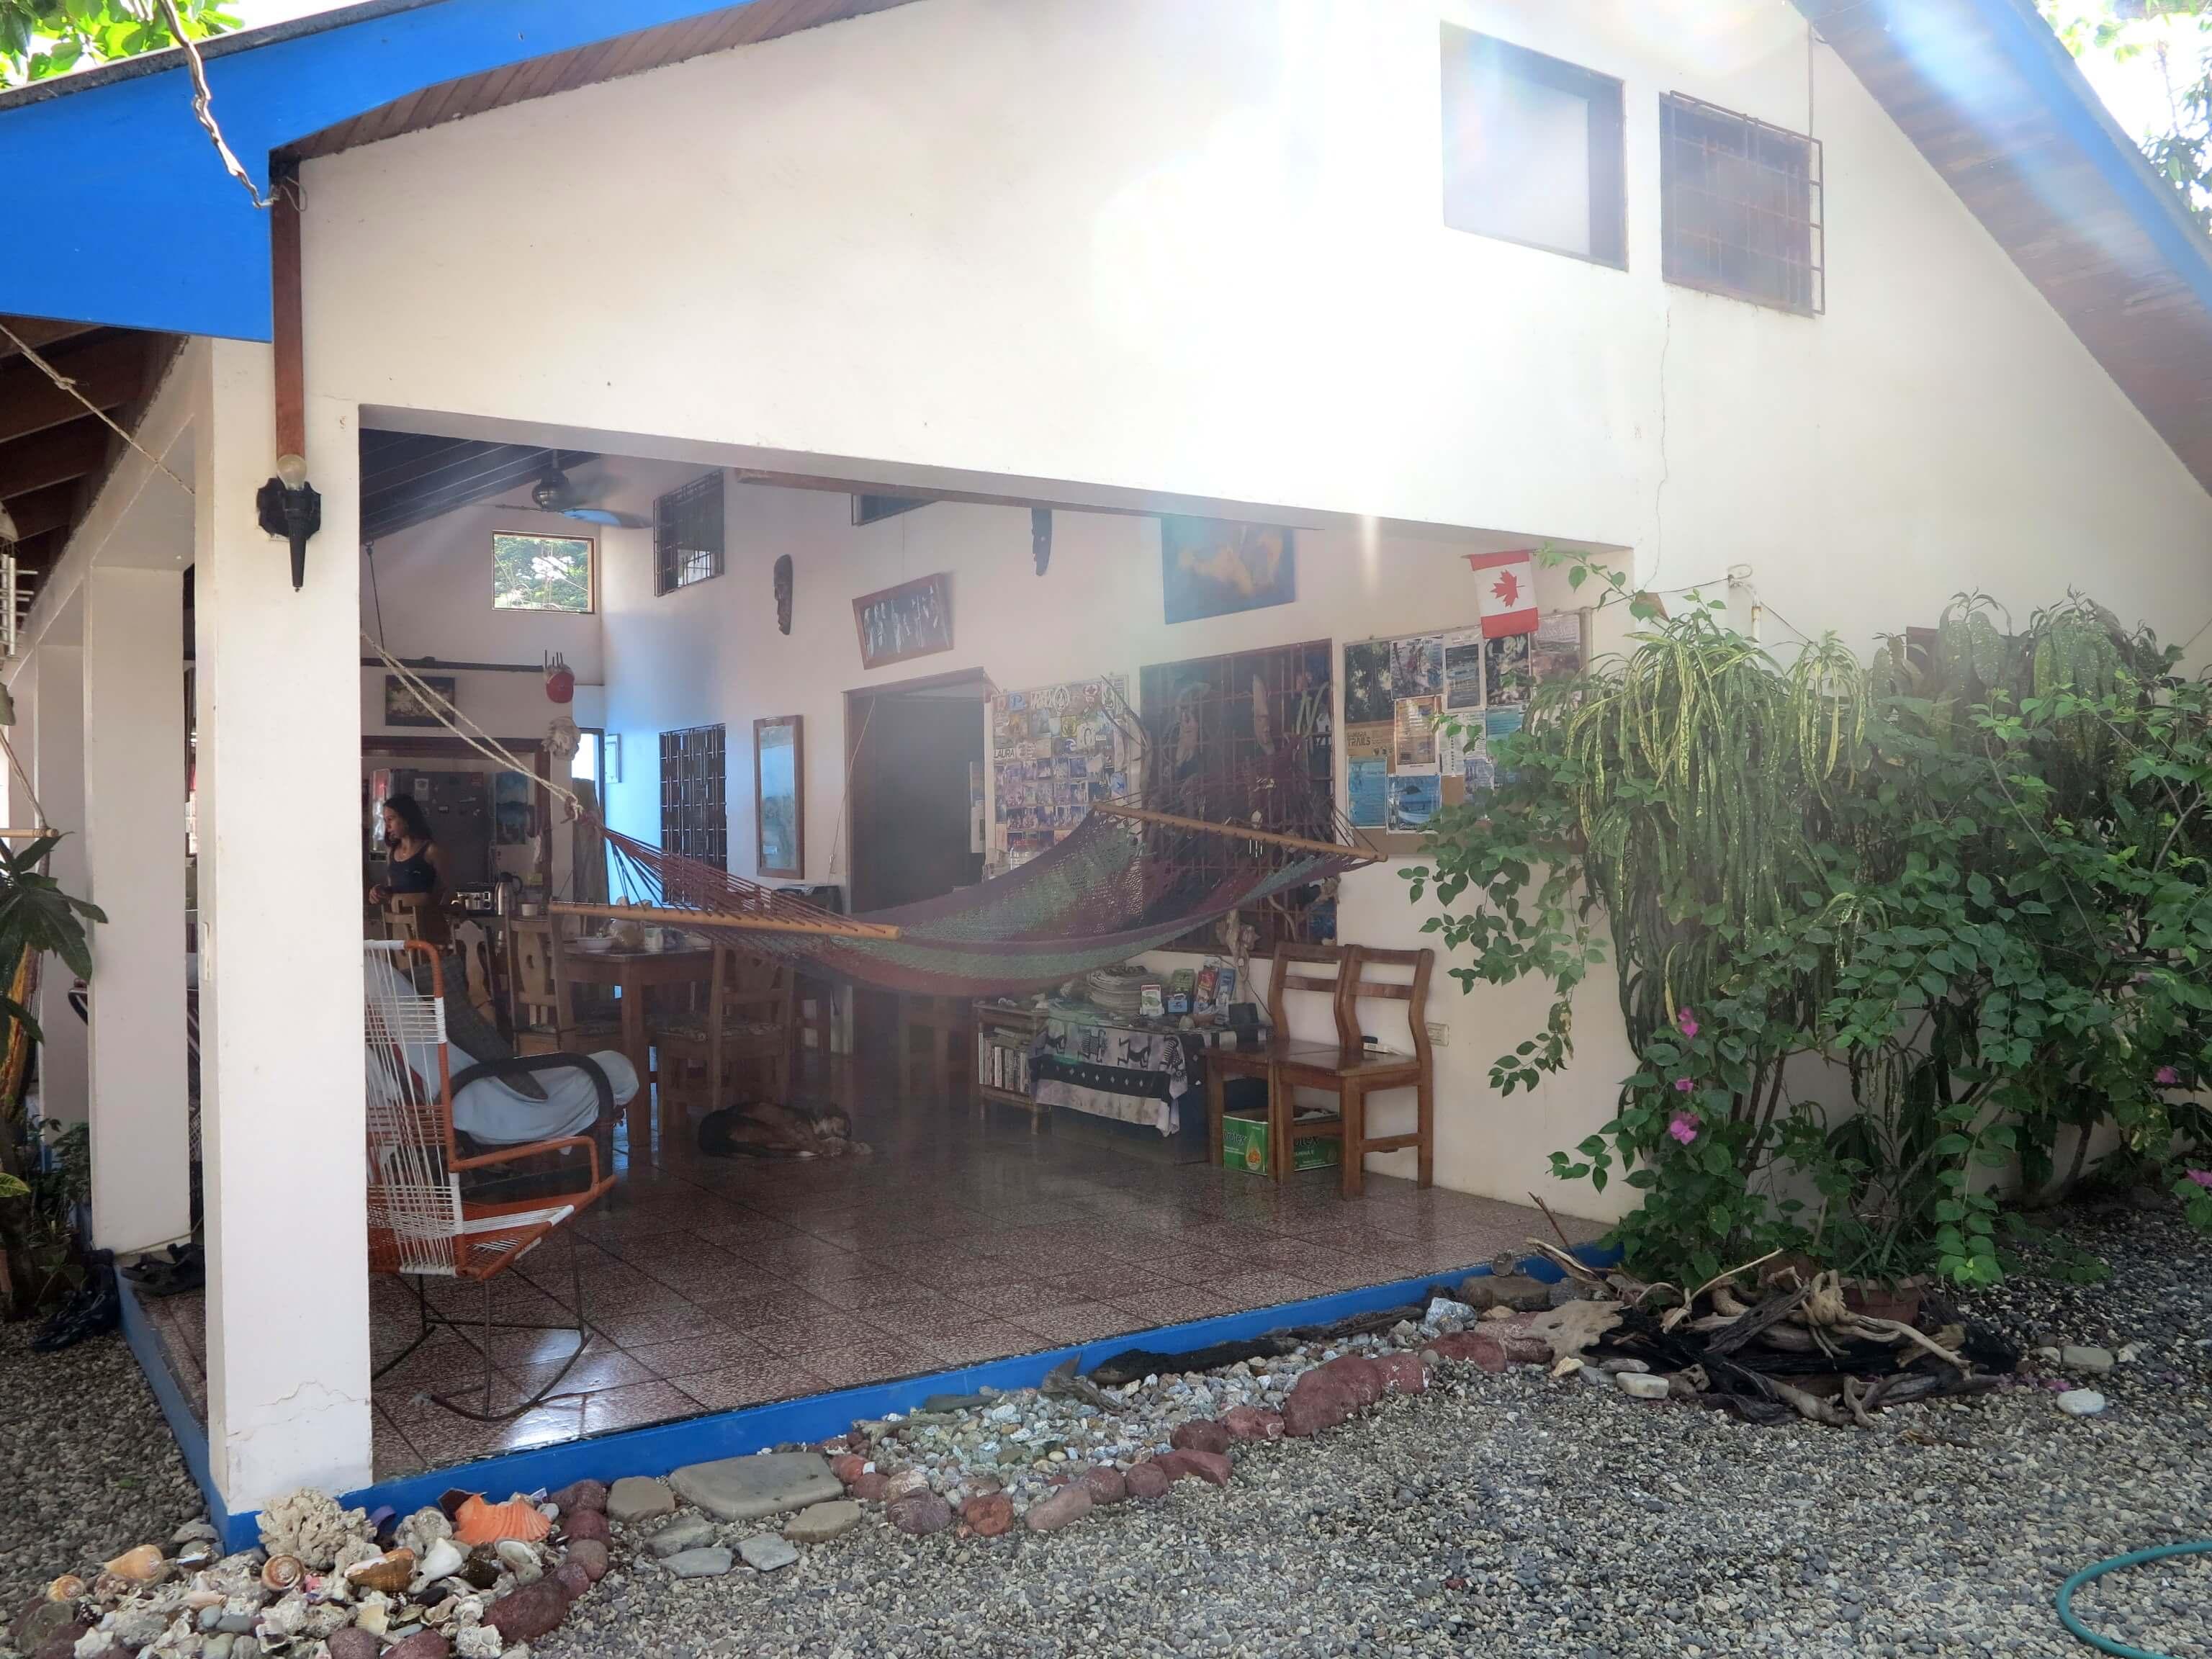 Hostel Casa Brian in Samara